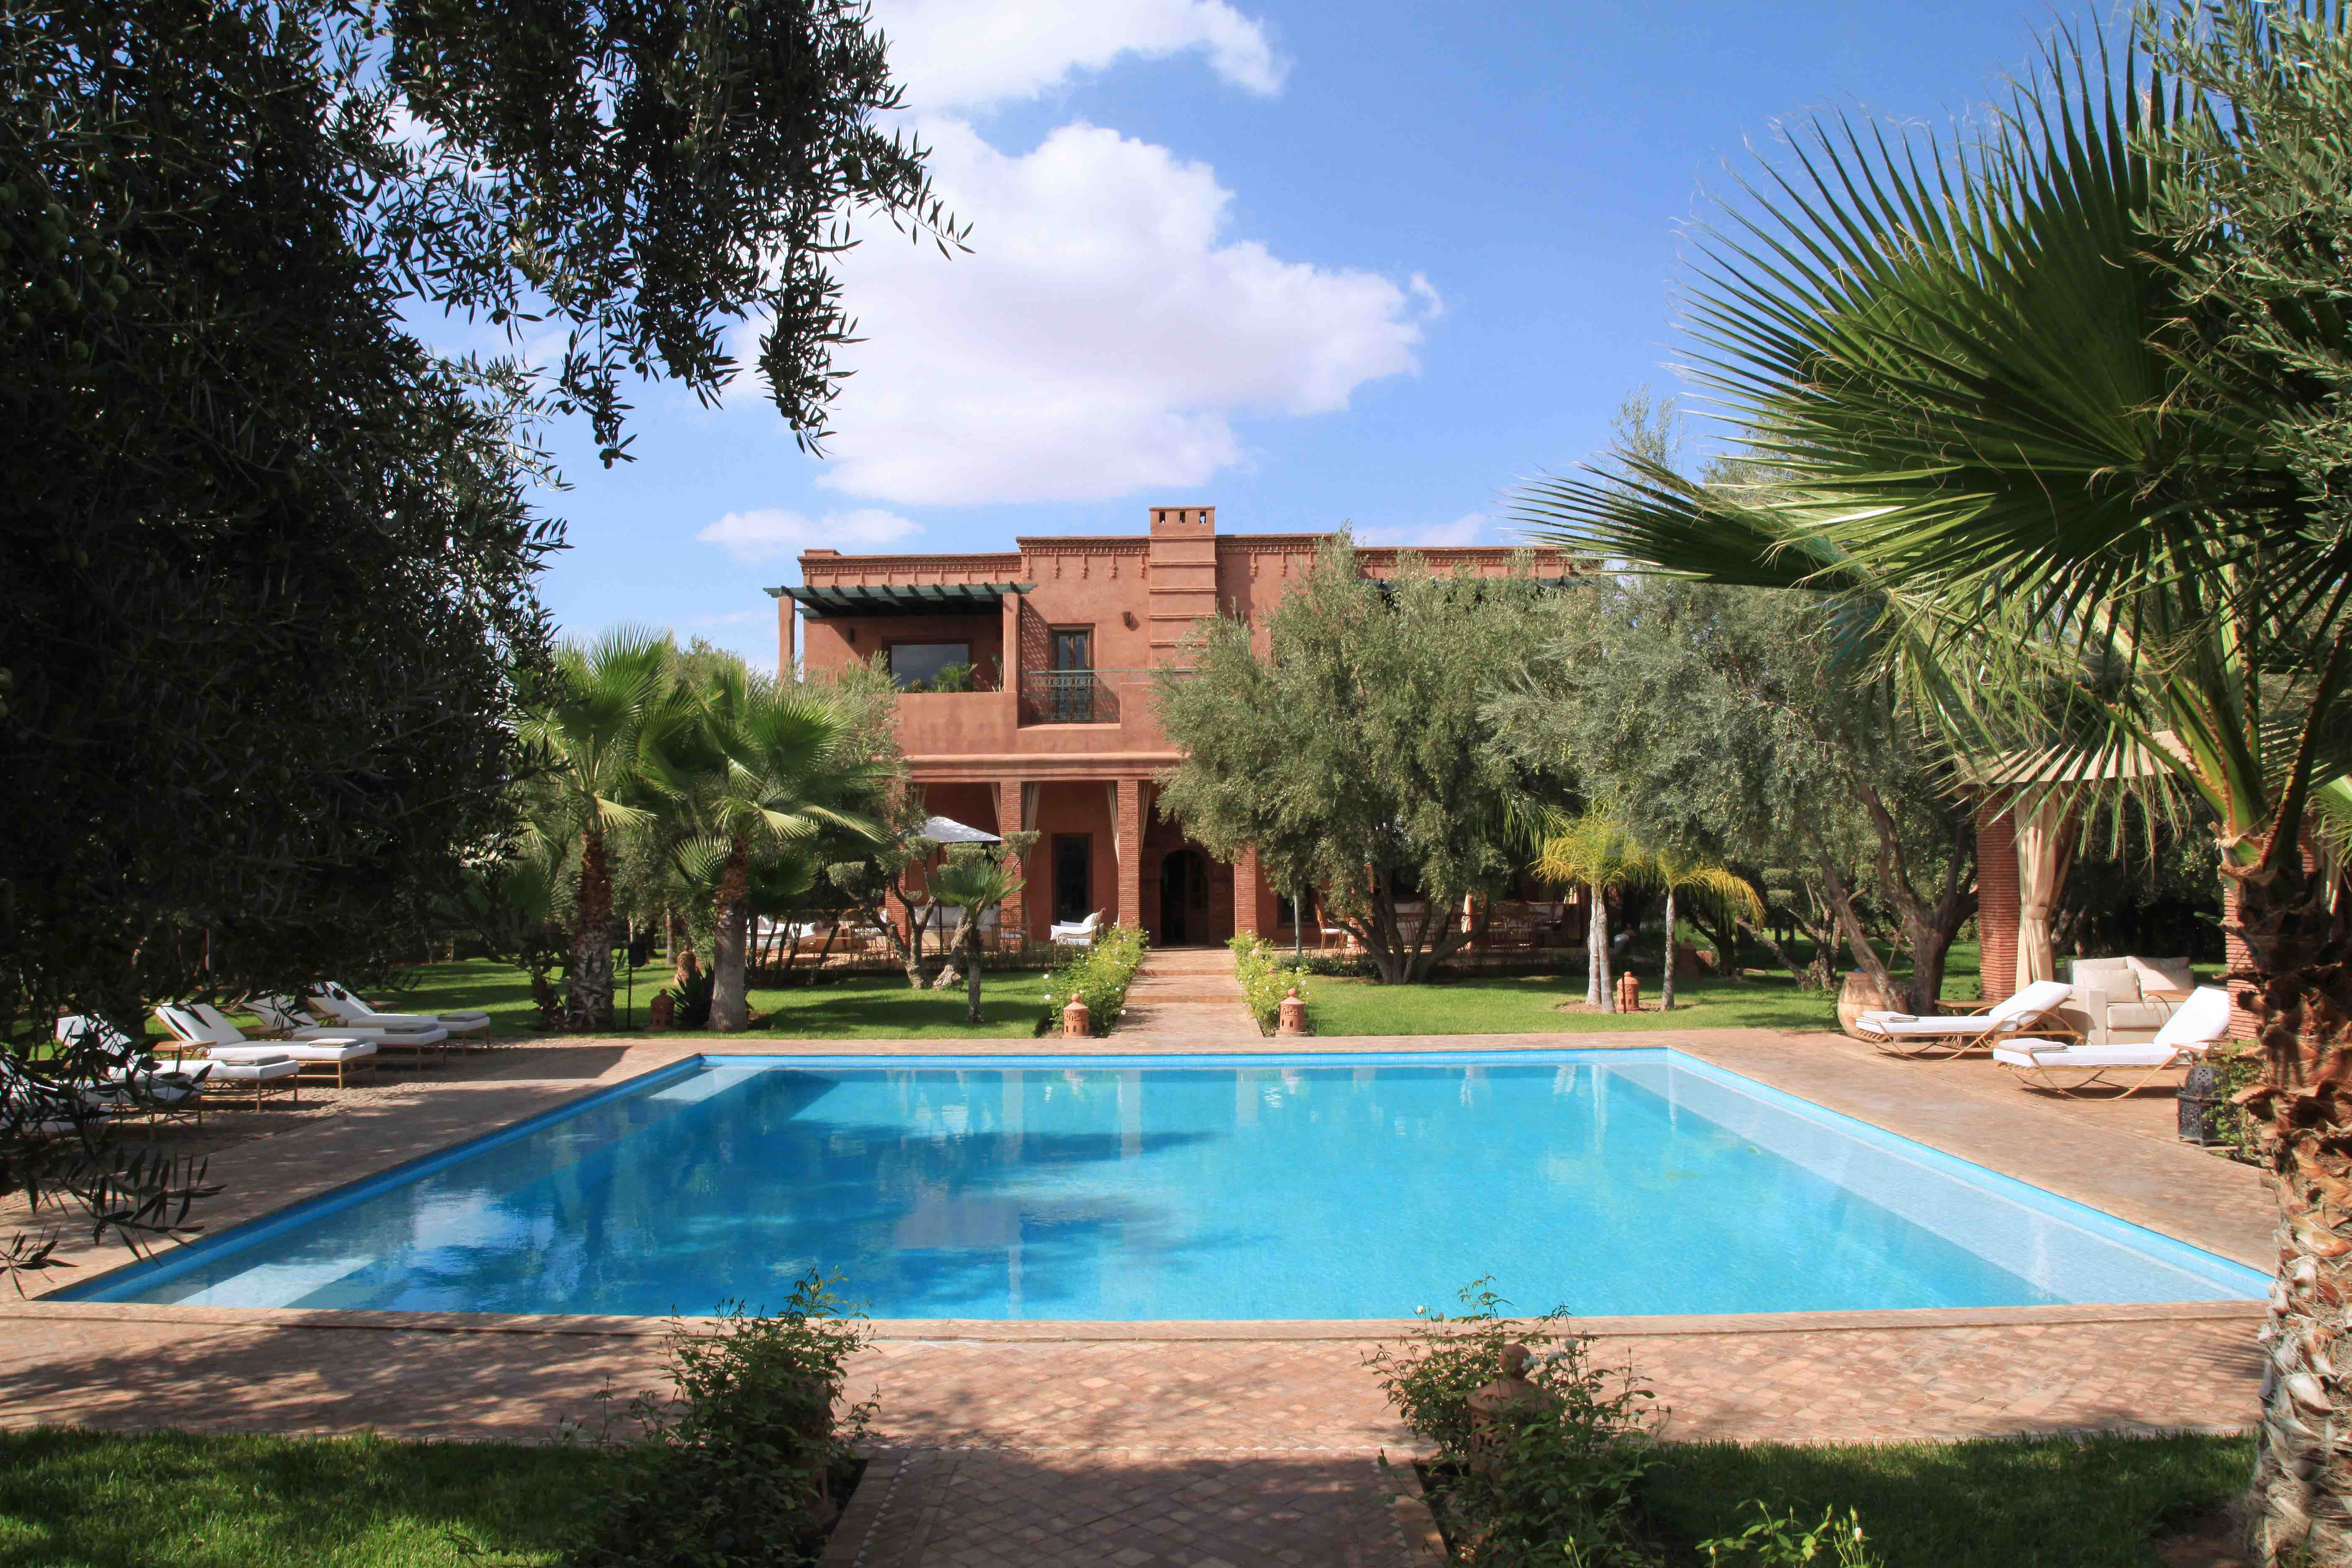 Maison d\'hôtes | Dar Layyina - Marrakech | Maroc